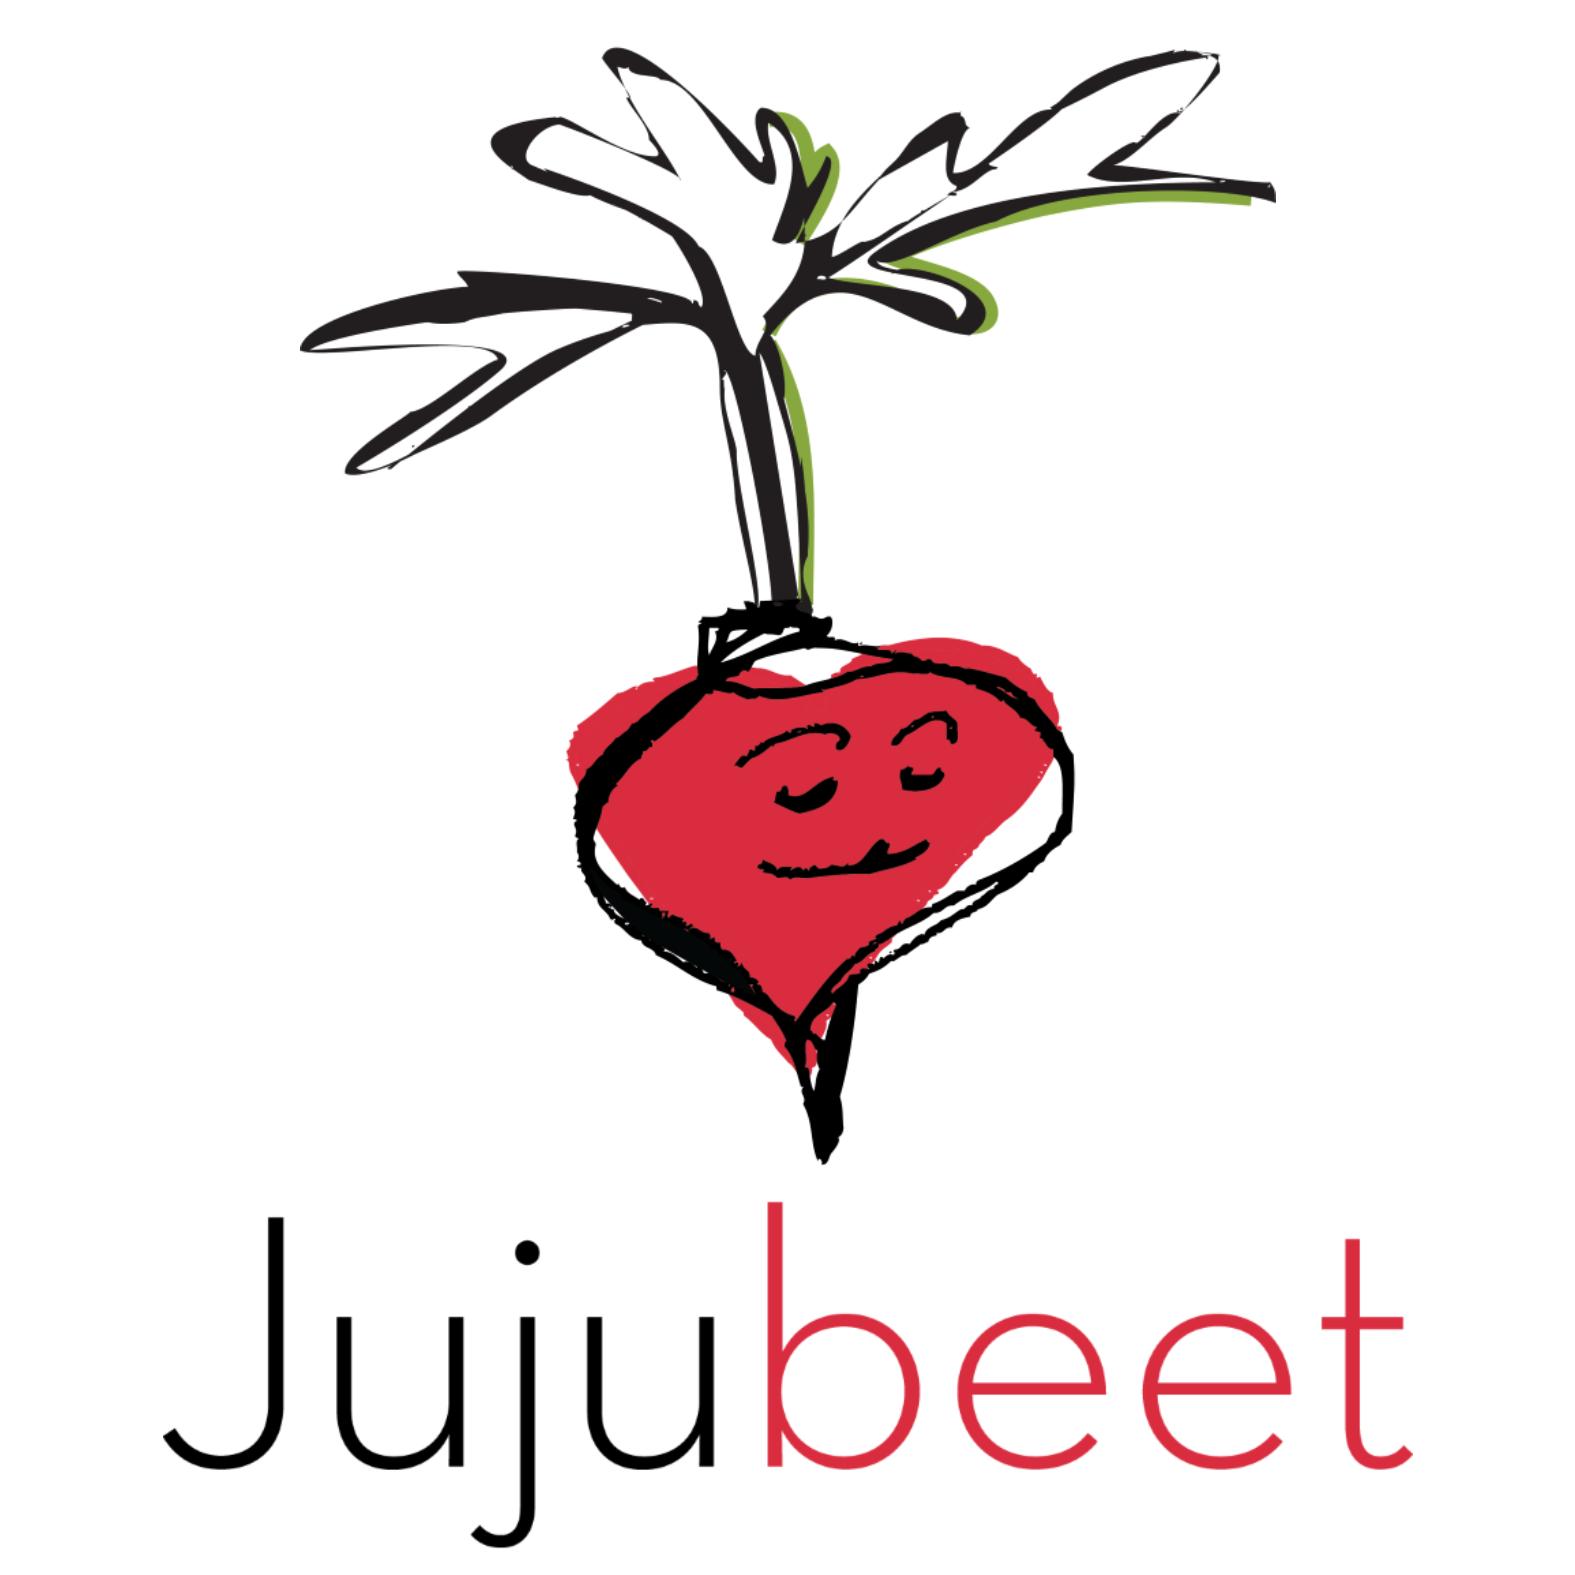 Jujubeet